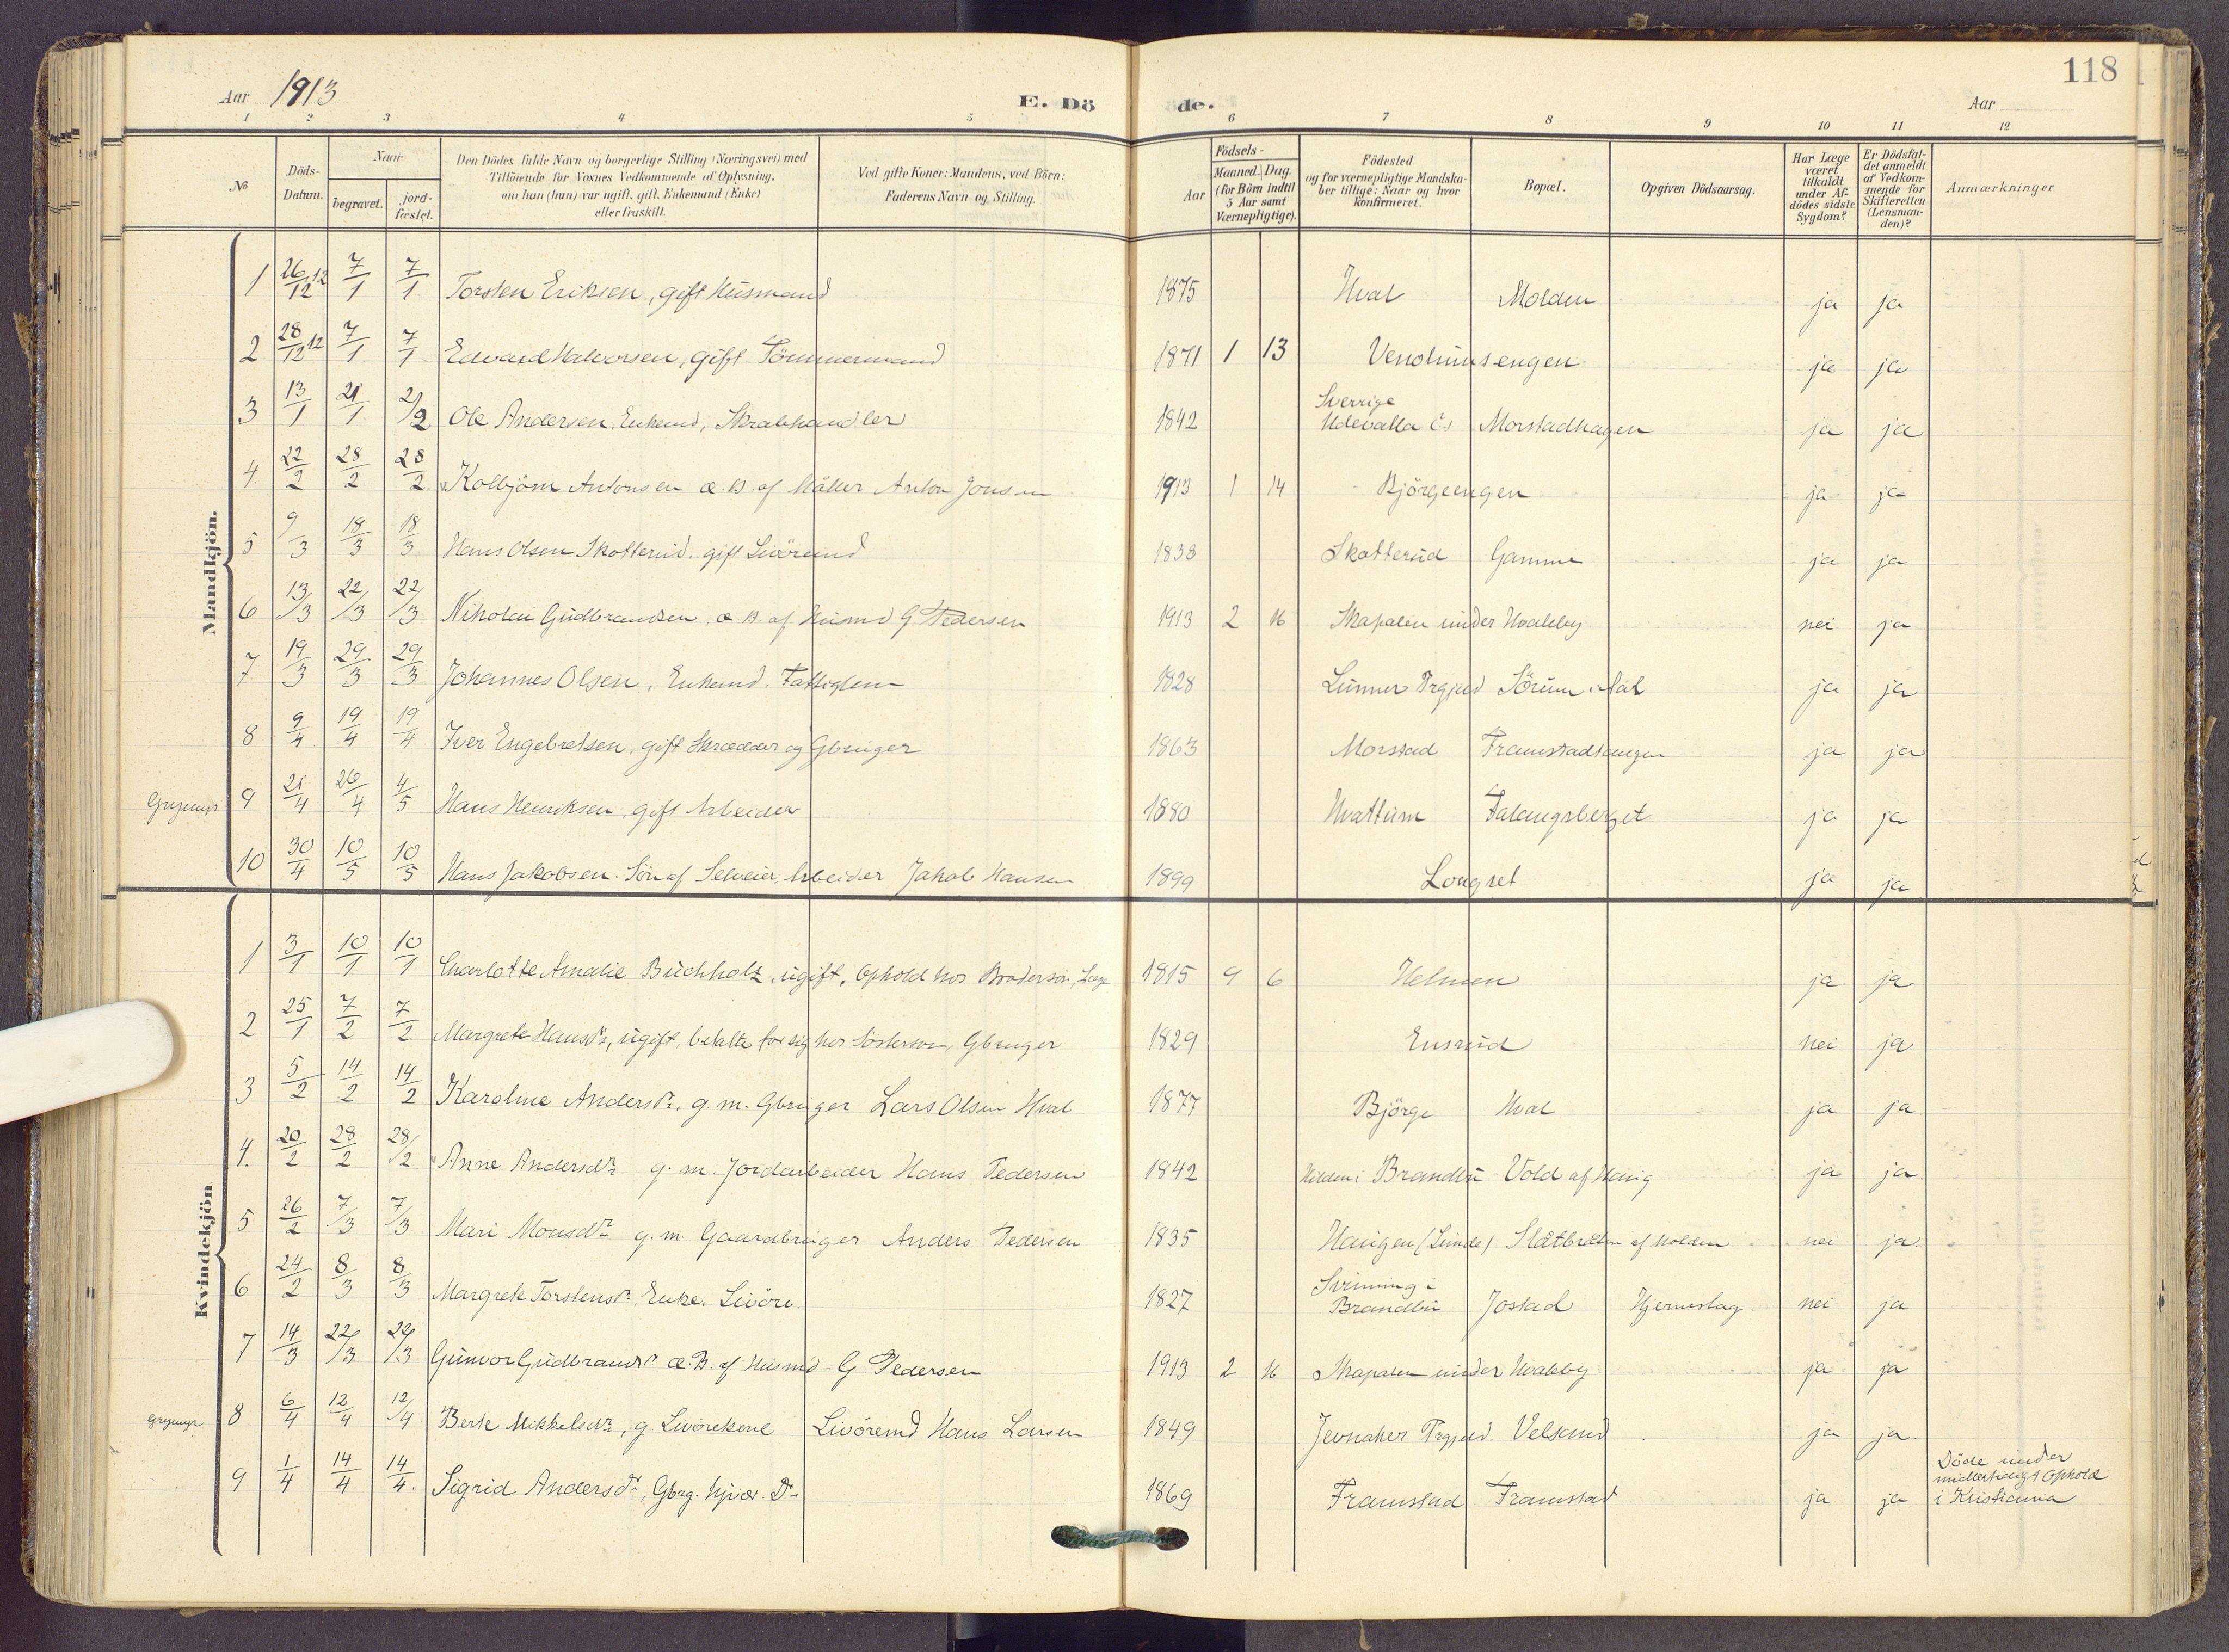 SAH, Gran prestekontor, Ministerialbok nr. 22, 1908-1918, s. 118